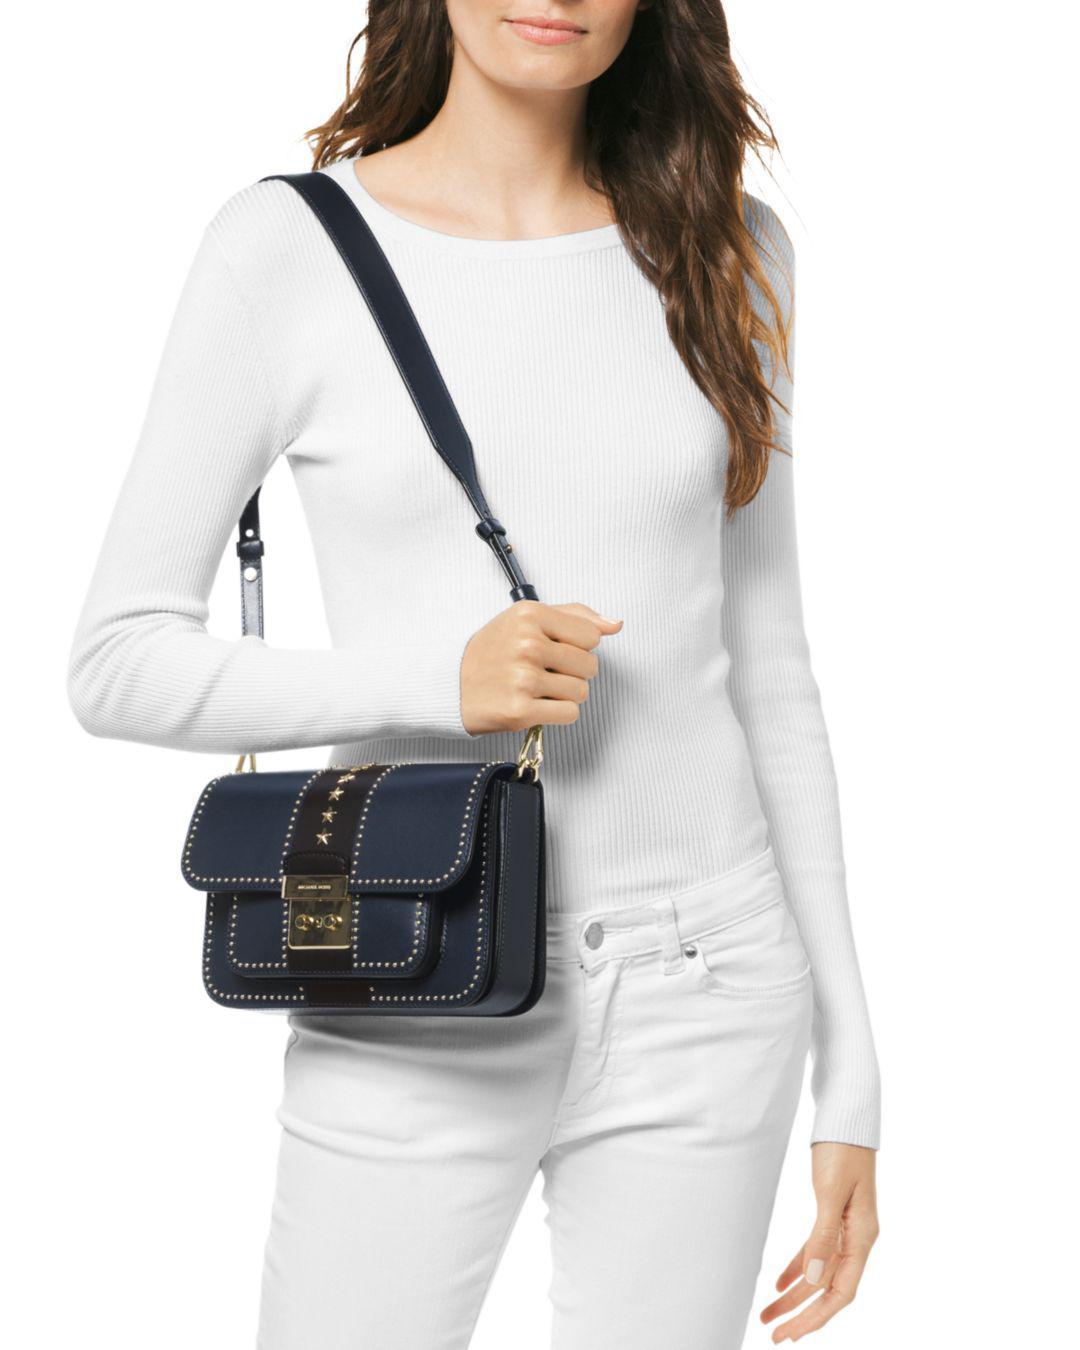 da0d7c5b6f84 MICHAEL Michael Kors Sloan Editor Large Shoulder Bag in Black - Lyst